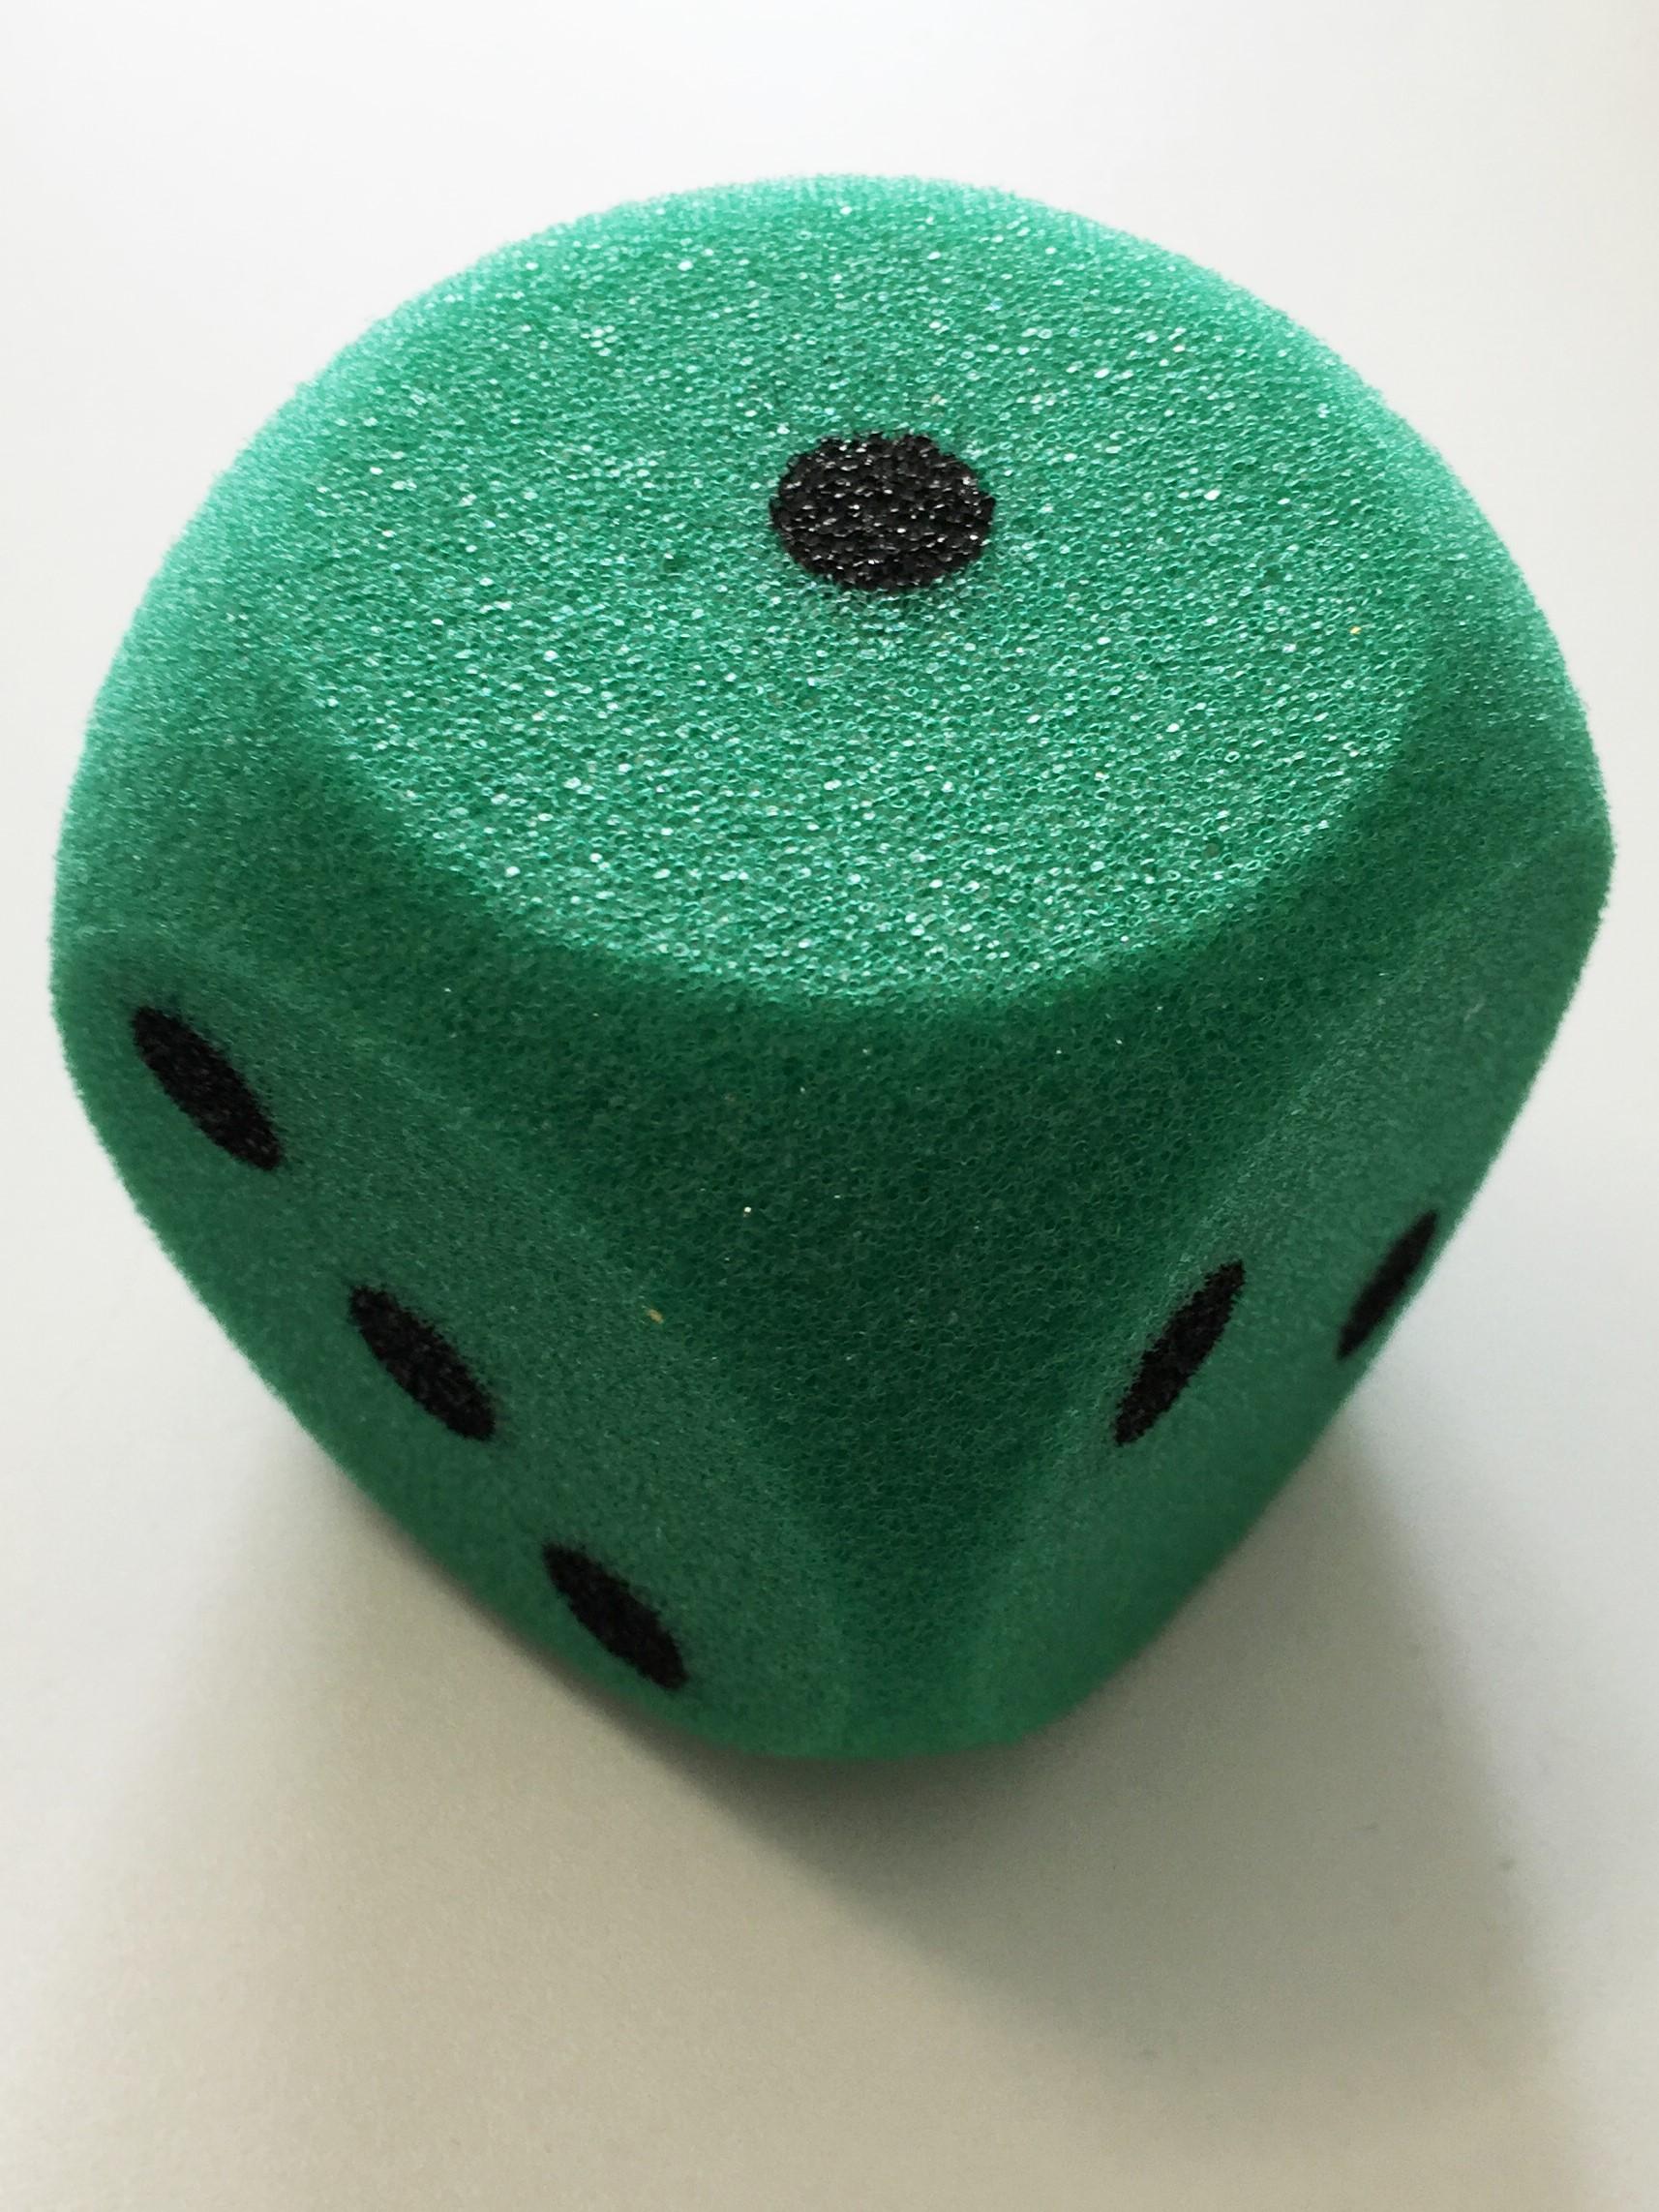 Cubo gomaespuma enorme verde